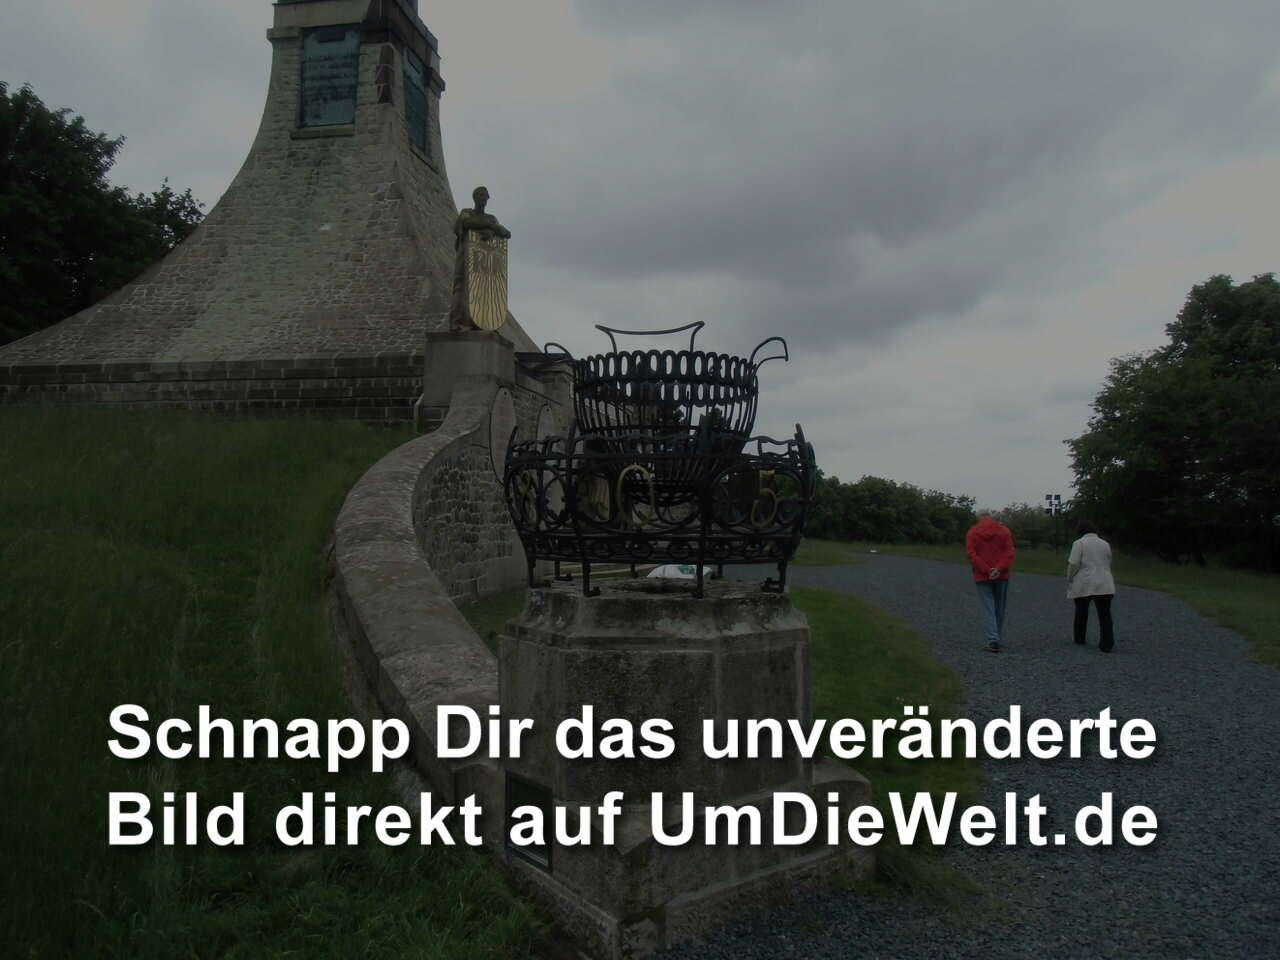 hauptstadt tschechei